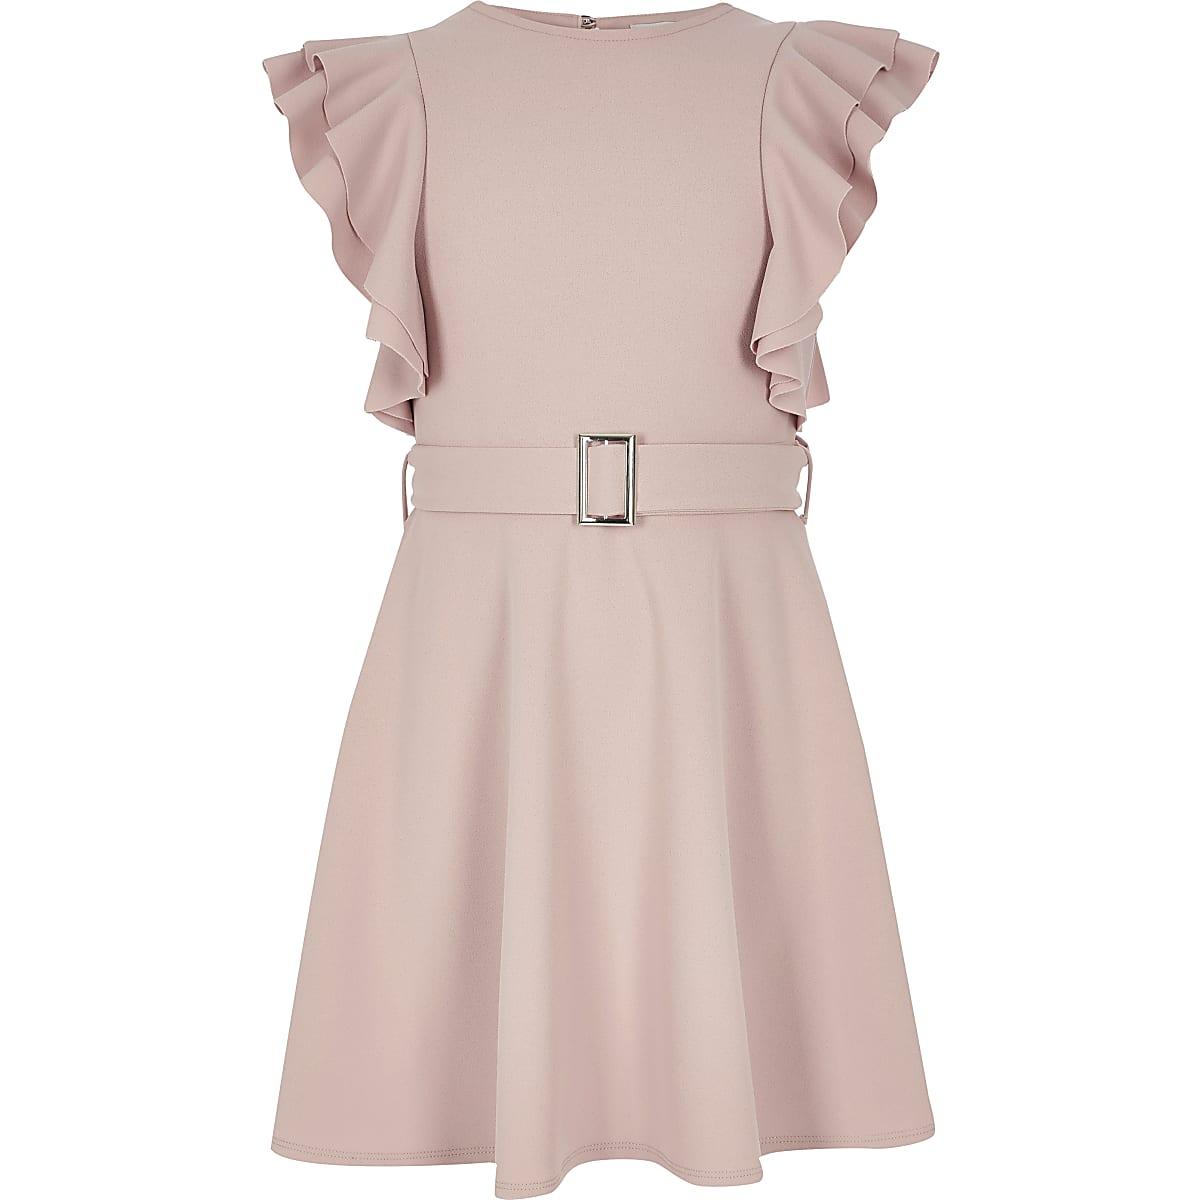 Girls pink ruffle belted dress